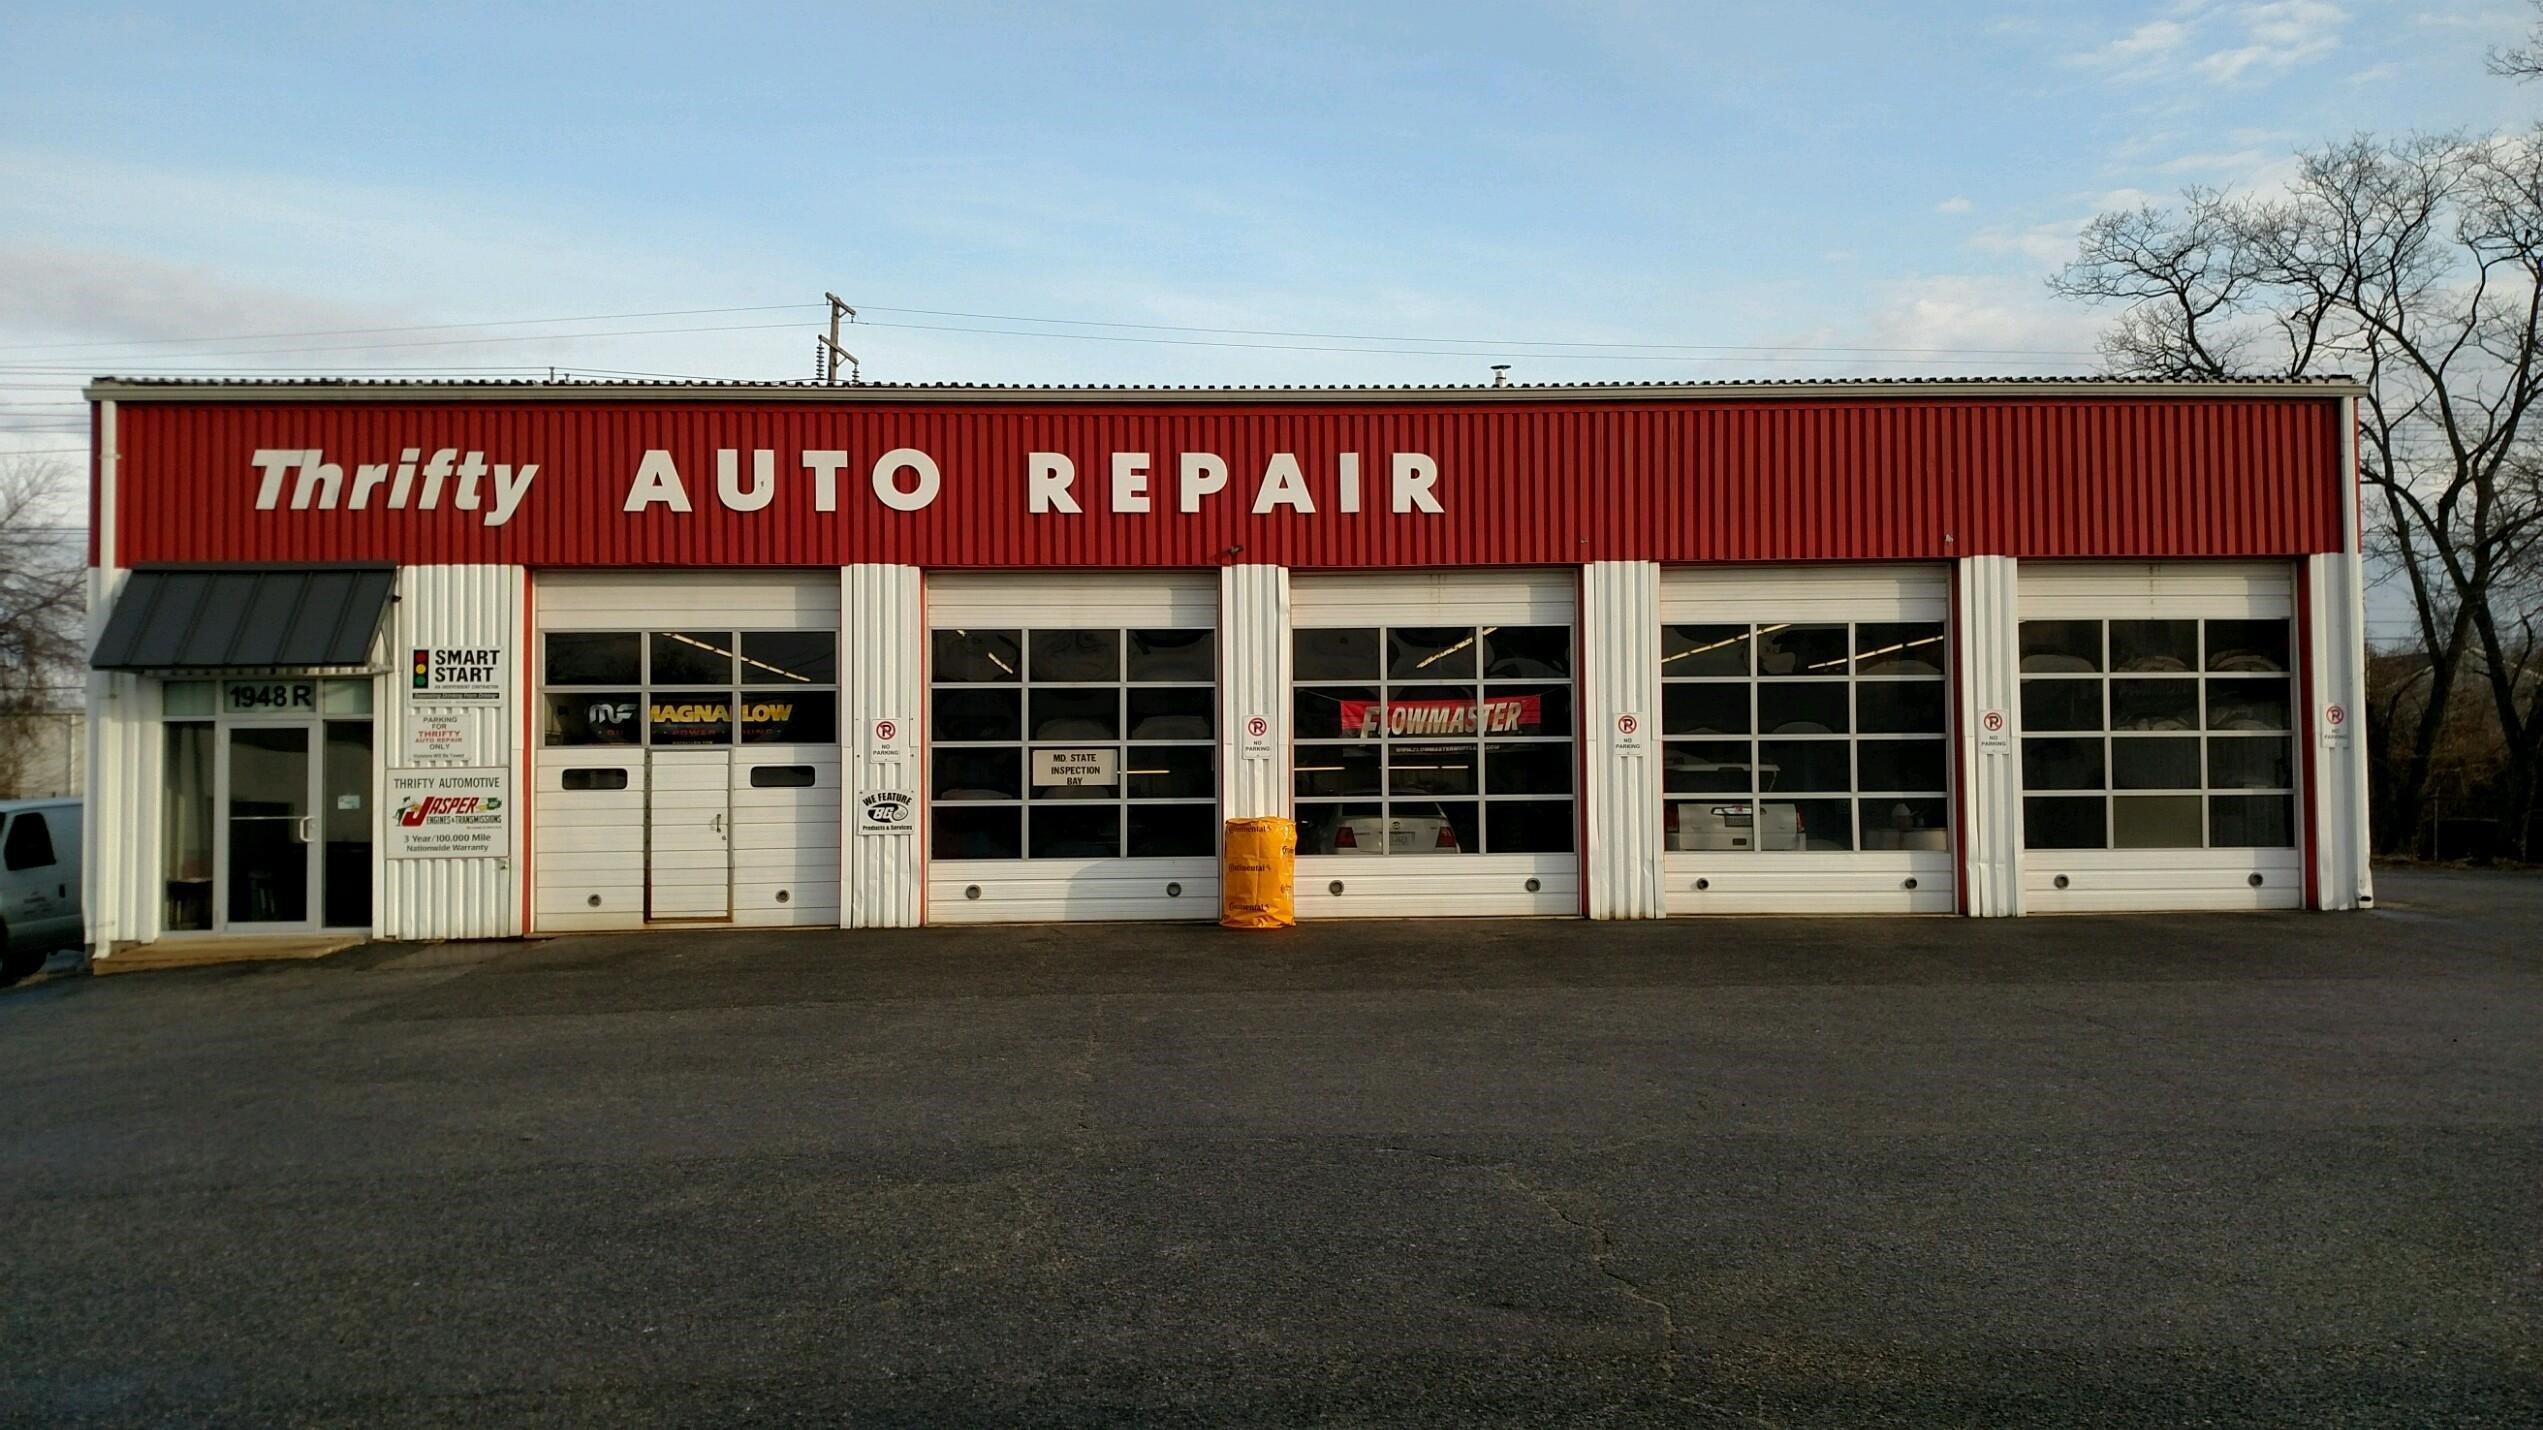 Thrifty Auto Repair Shop